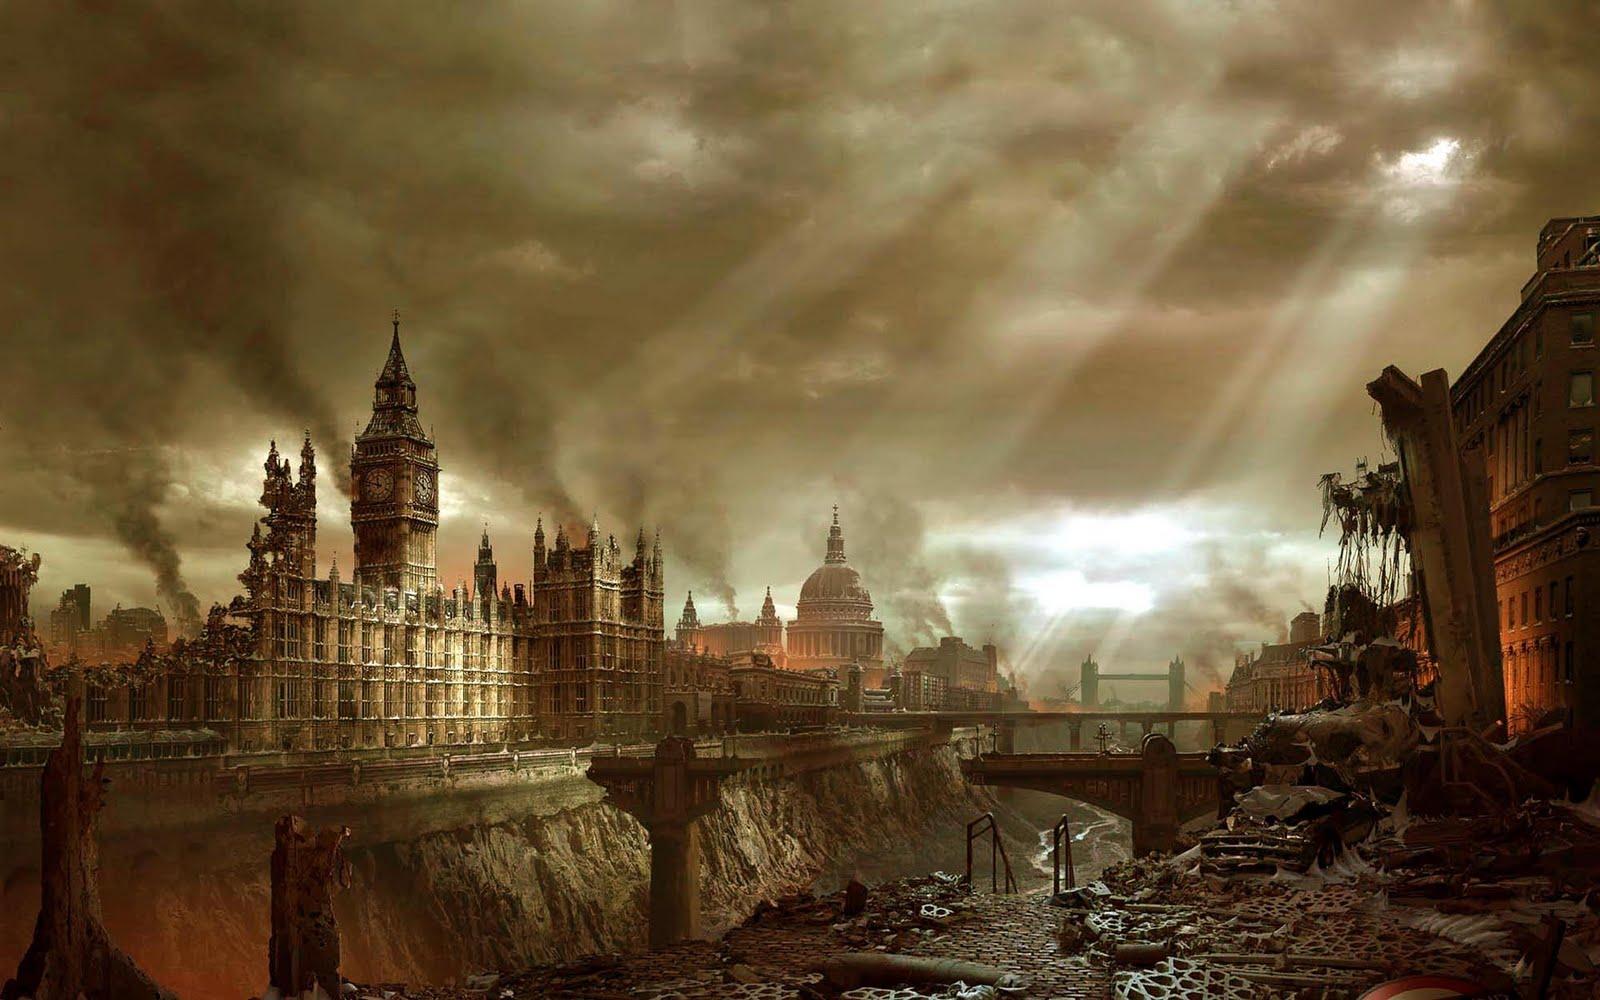 http://4.bp.blogspot.com/-zG4GNPyWXG4/Tme98Q6JpPI/AAAAAAAAAXs/StX1LtmBNMg/s1600/Post-Apocalyptic-london.jpg